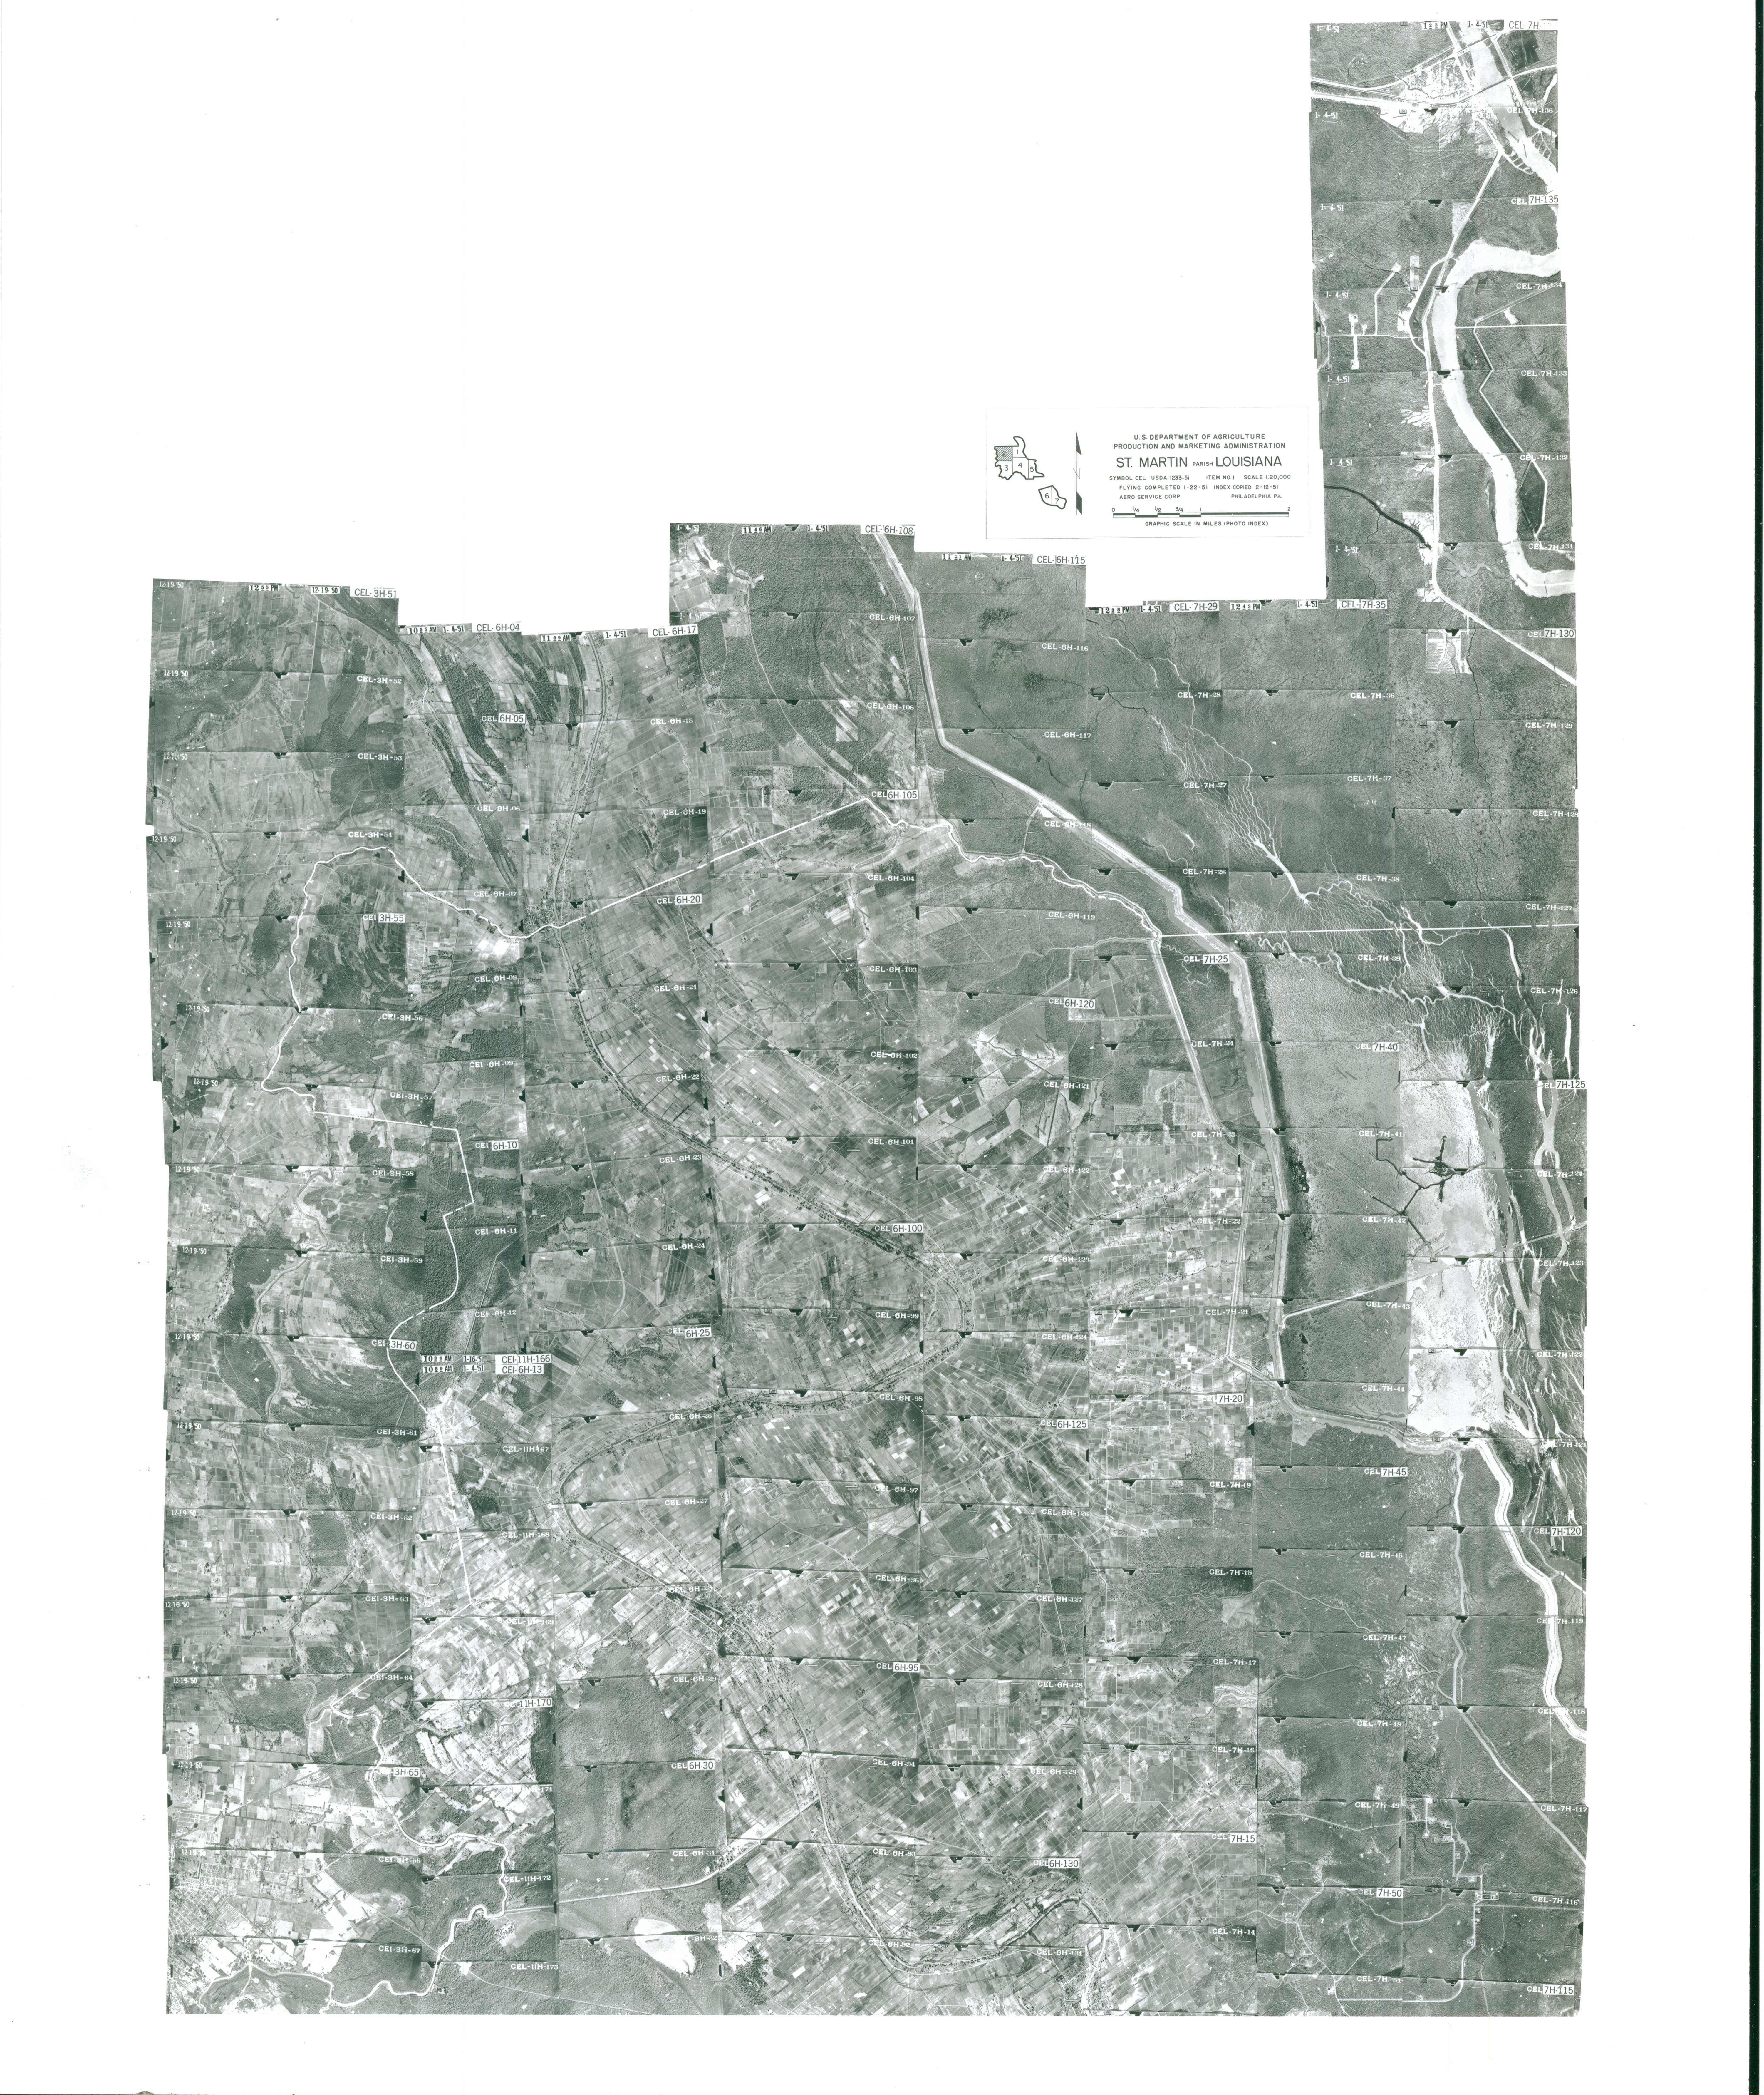 Index to Aerial Photography of St Martin Parish, Louisiana 2